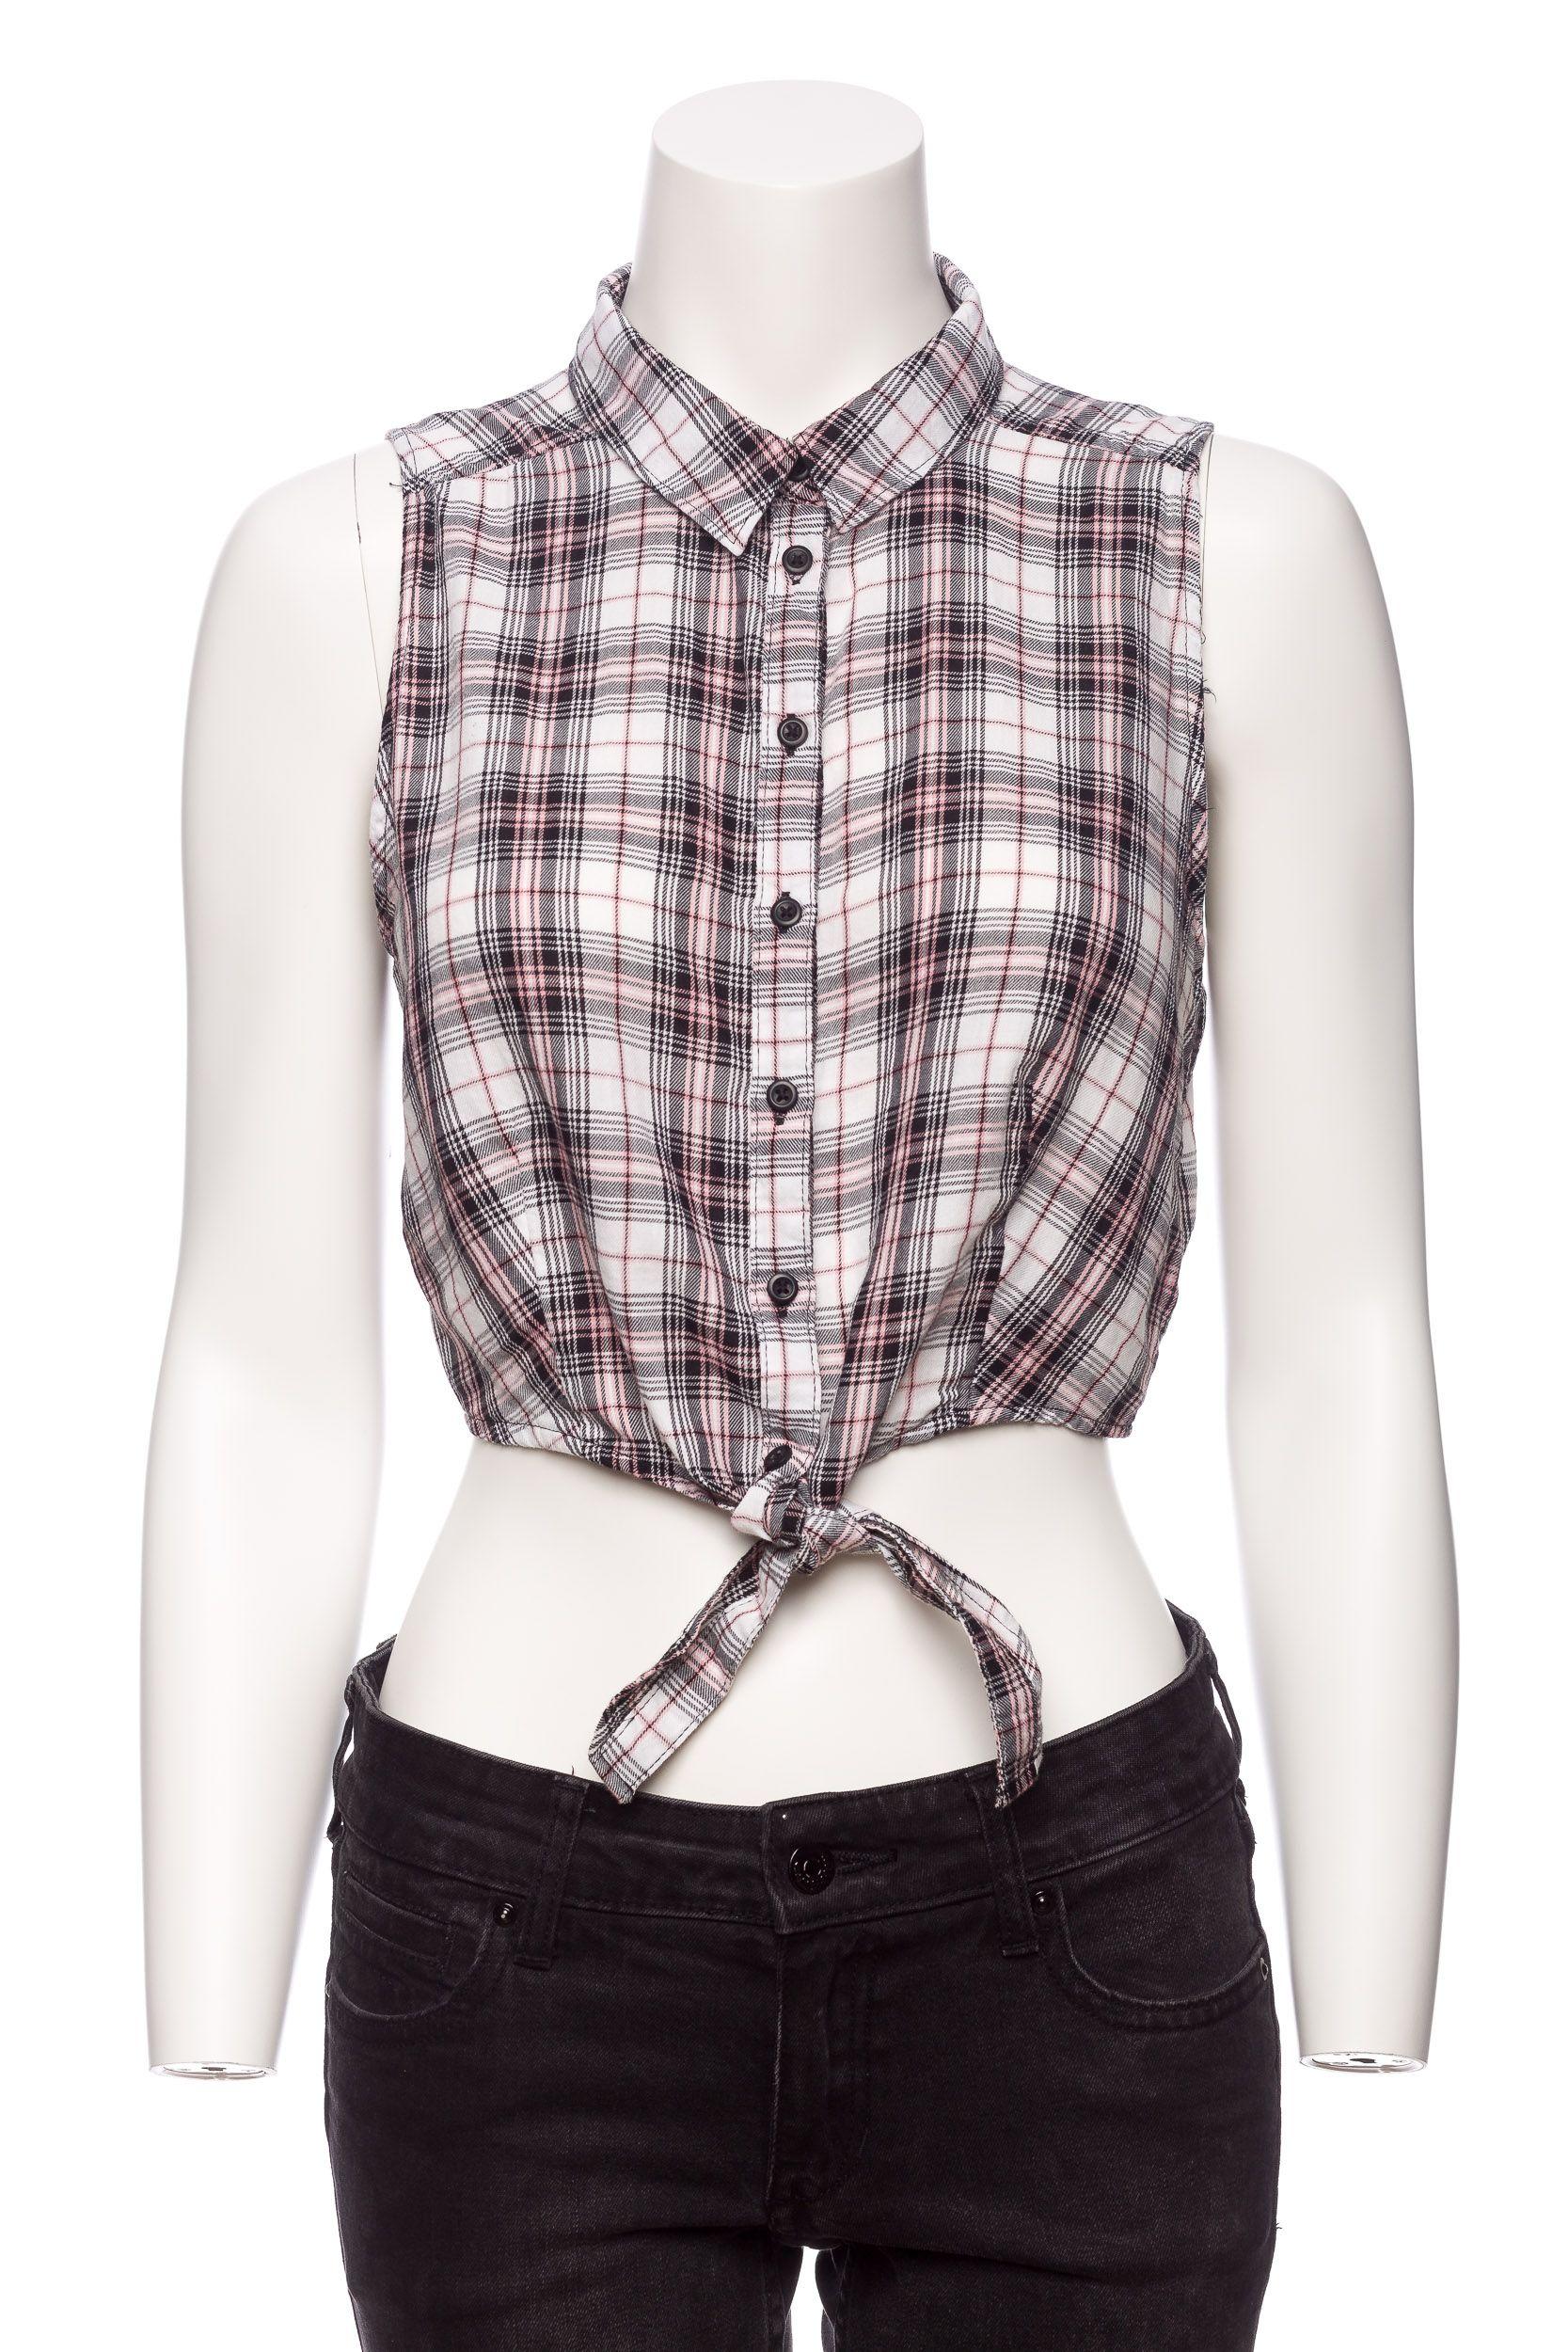 H&M wiązana koszula w kratę crop top r.S